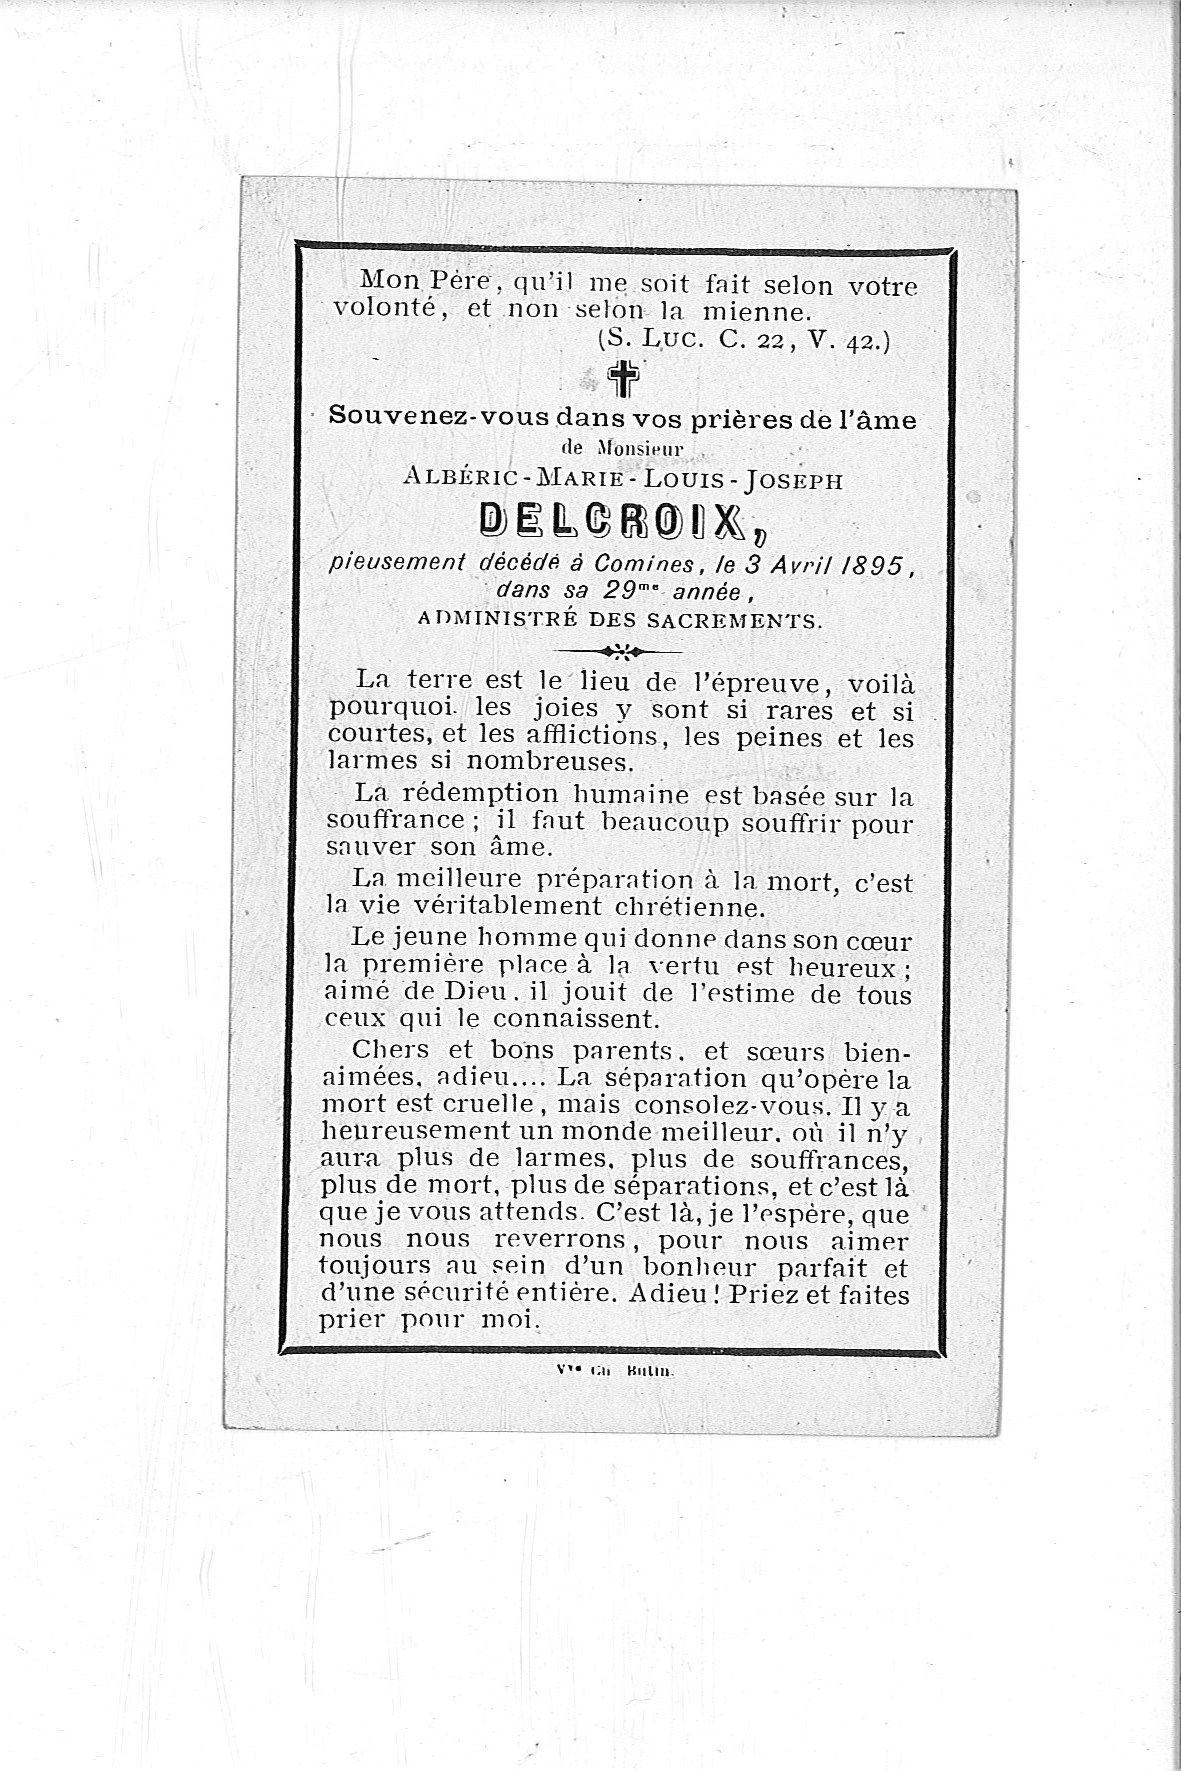 Albéric-Marie-Louis-Joseph(1895)20090916165042_00026.jpg